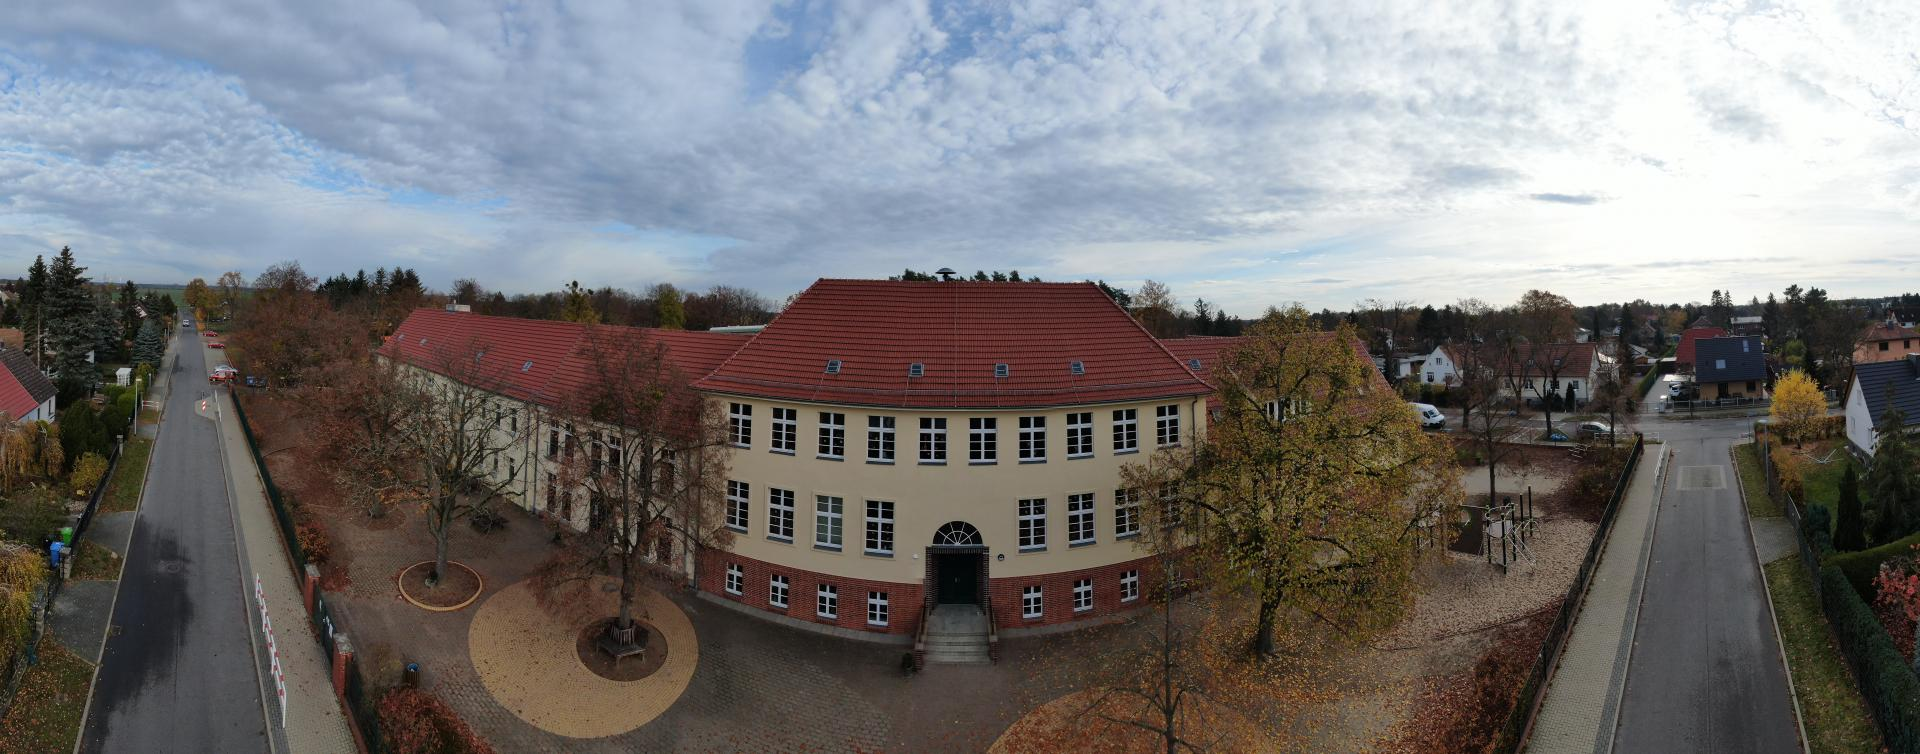 panoschule